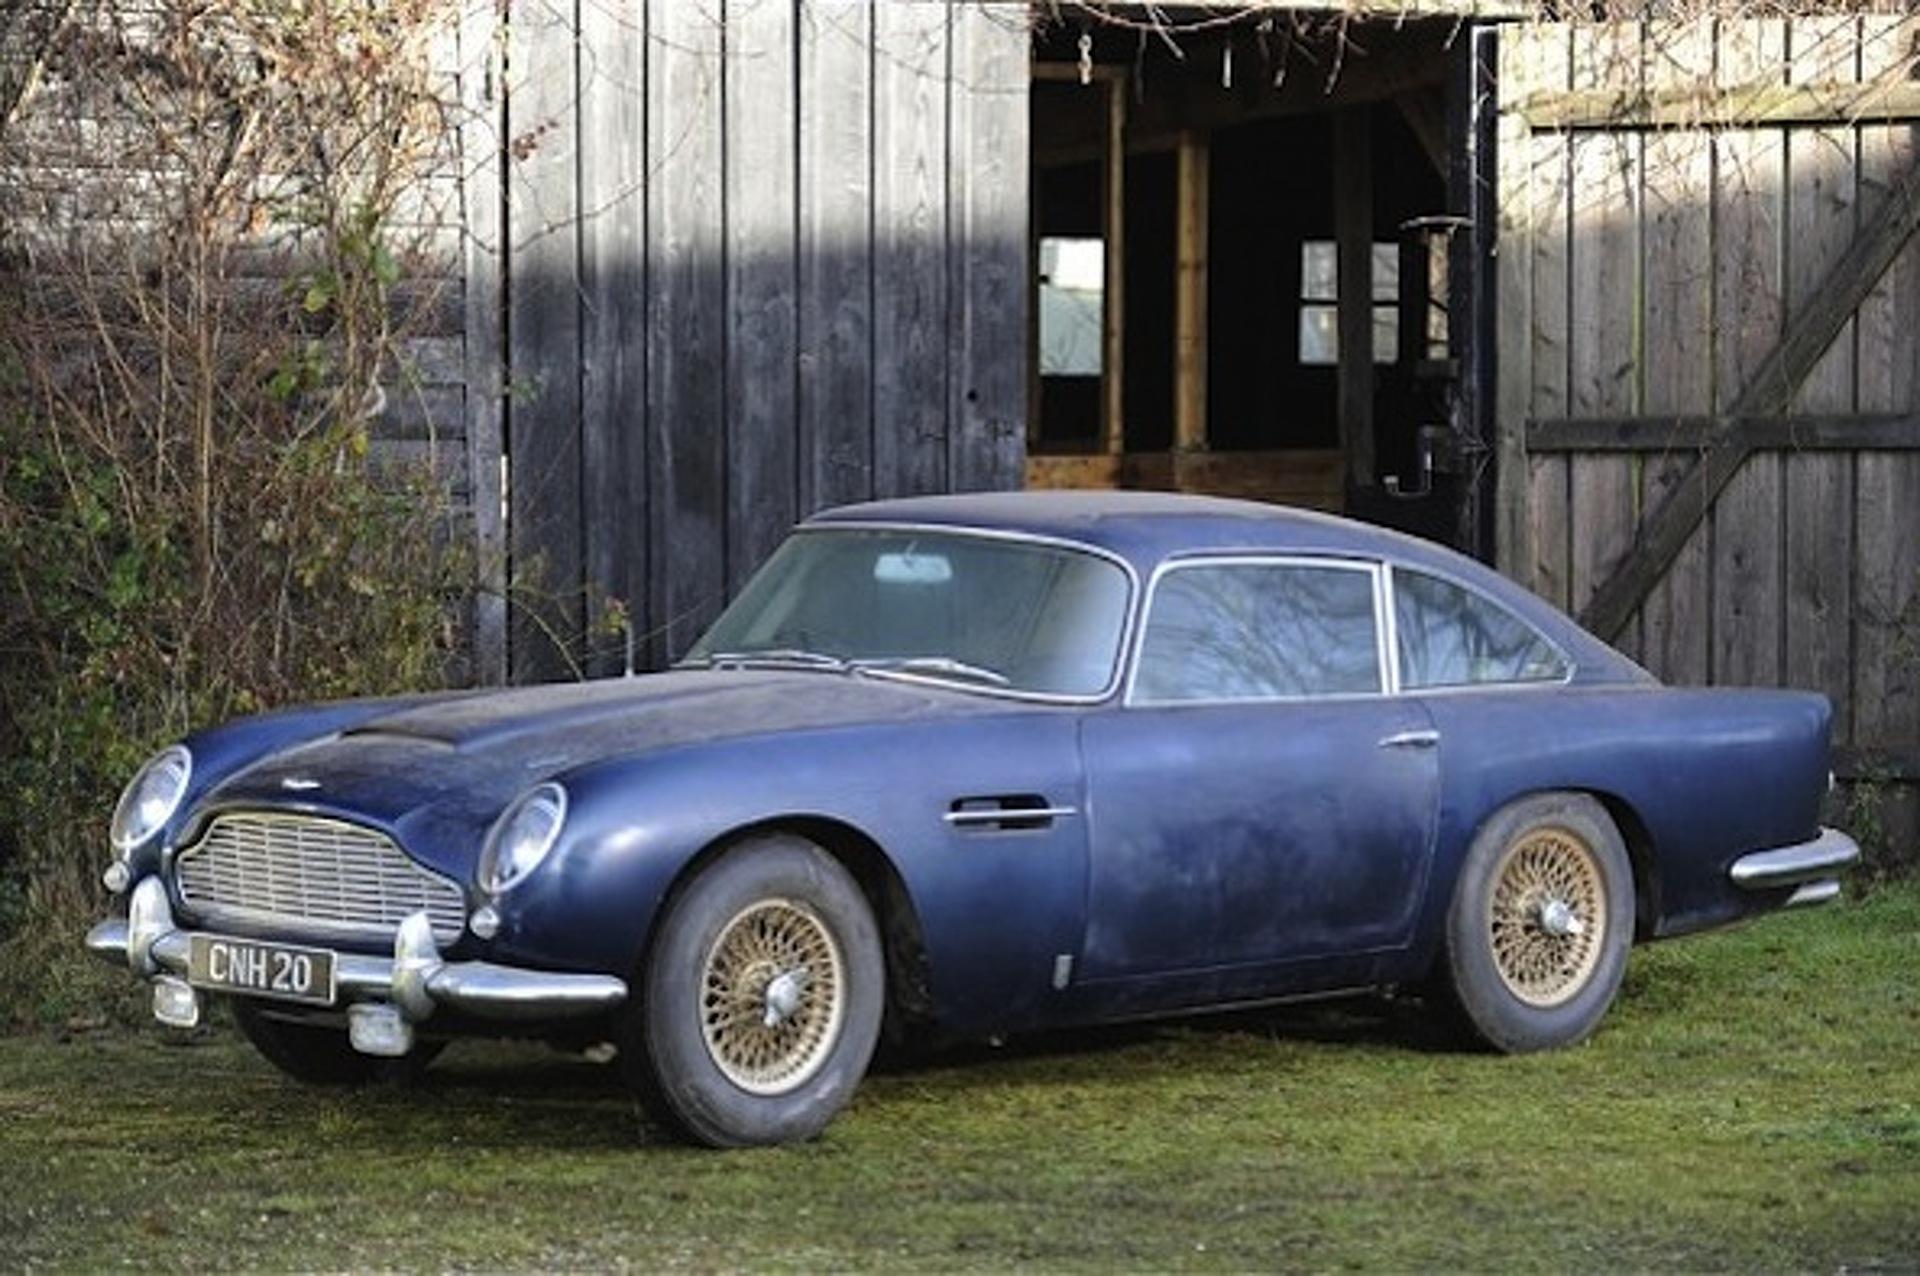 $300K Aston Martin DB5 Barn Find Set for Auction